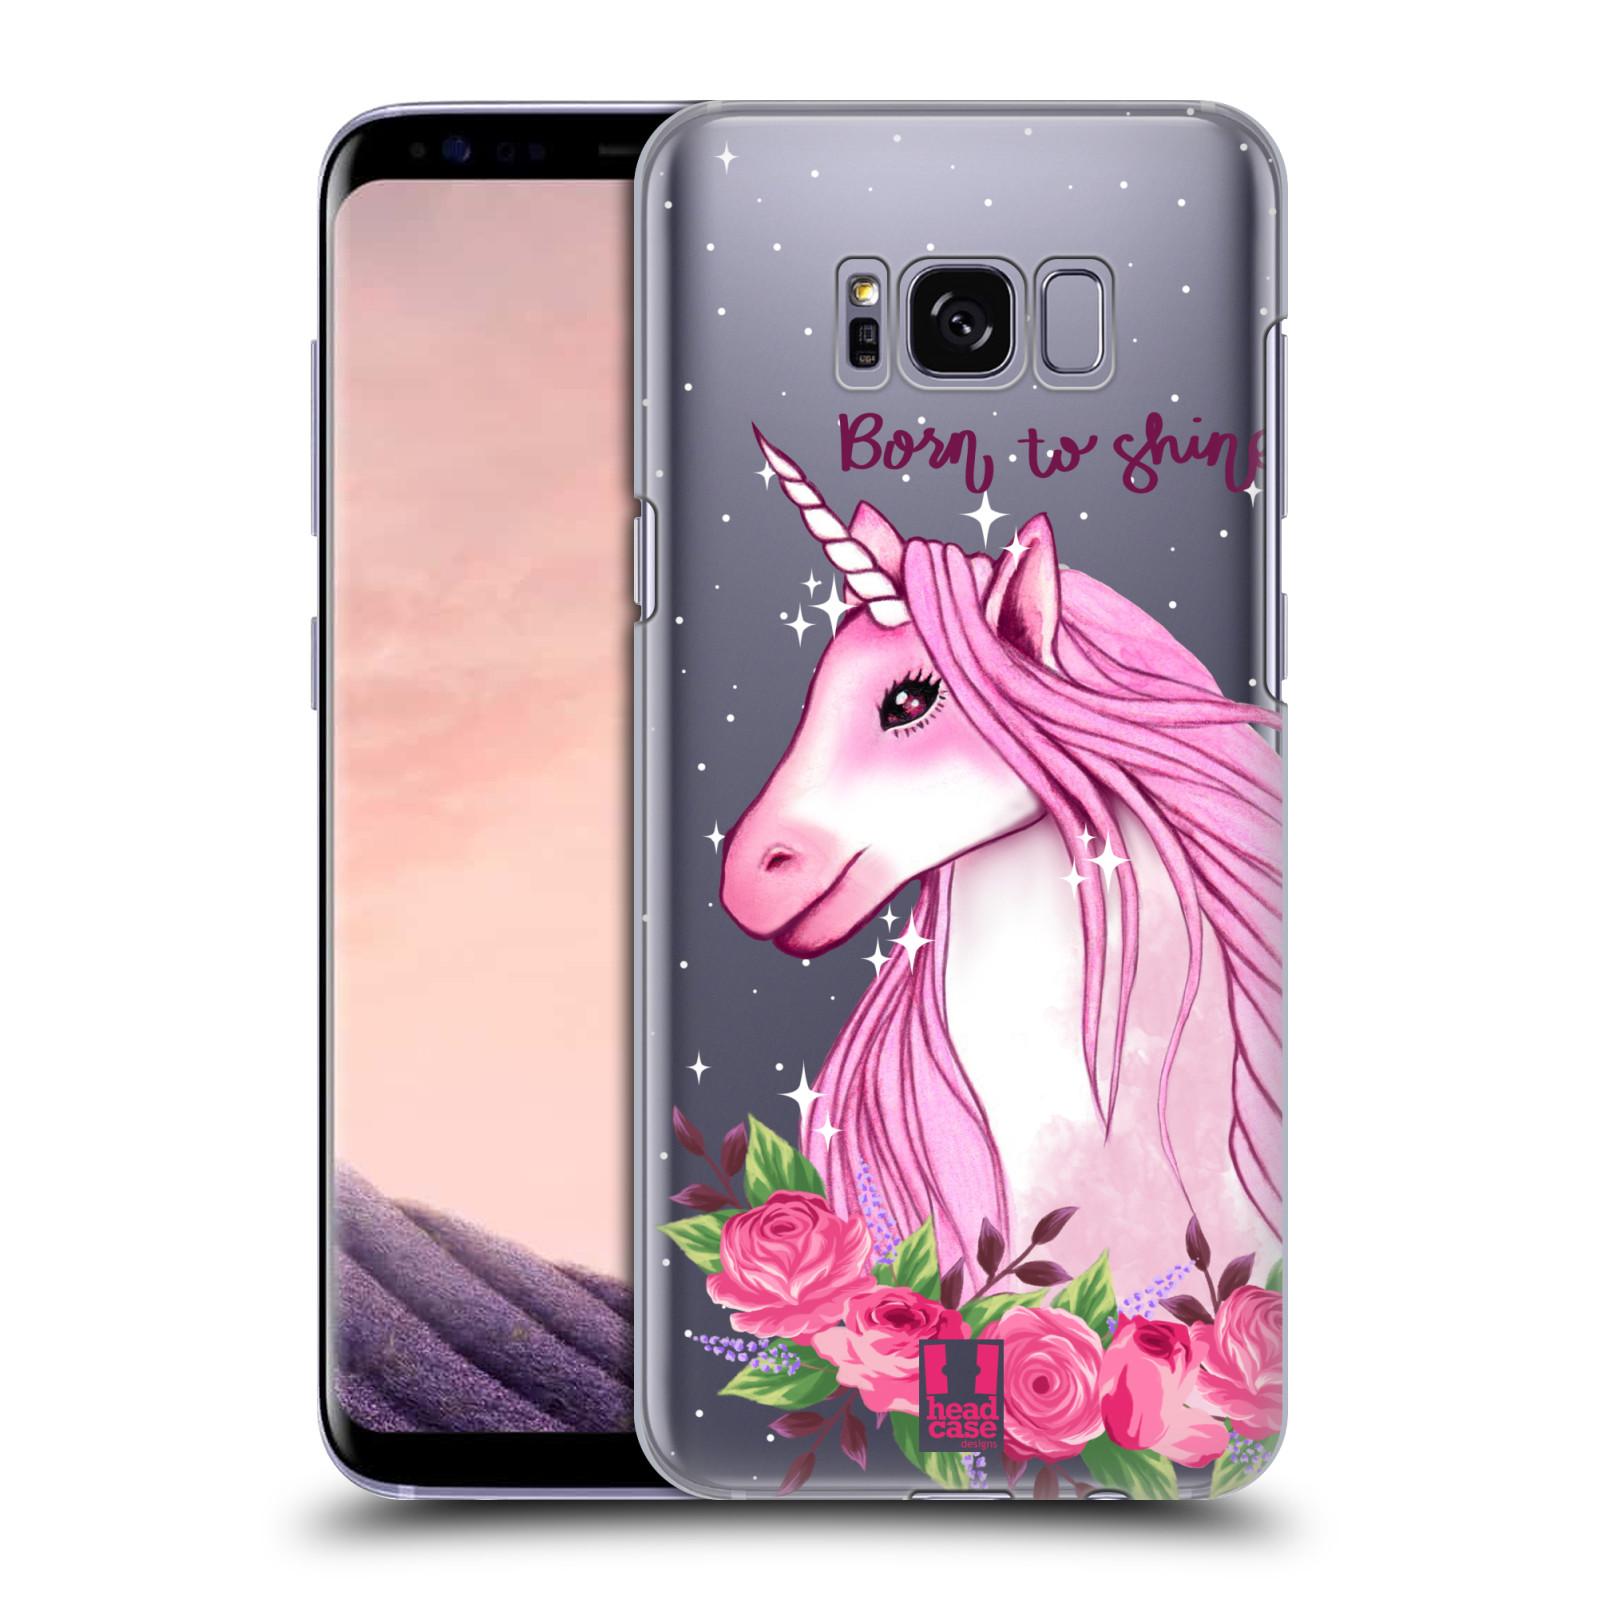 Plastové pouzdro na mobil Samsung Galaxy S8 - Head Case - Jednorožec - Born to shine